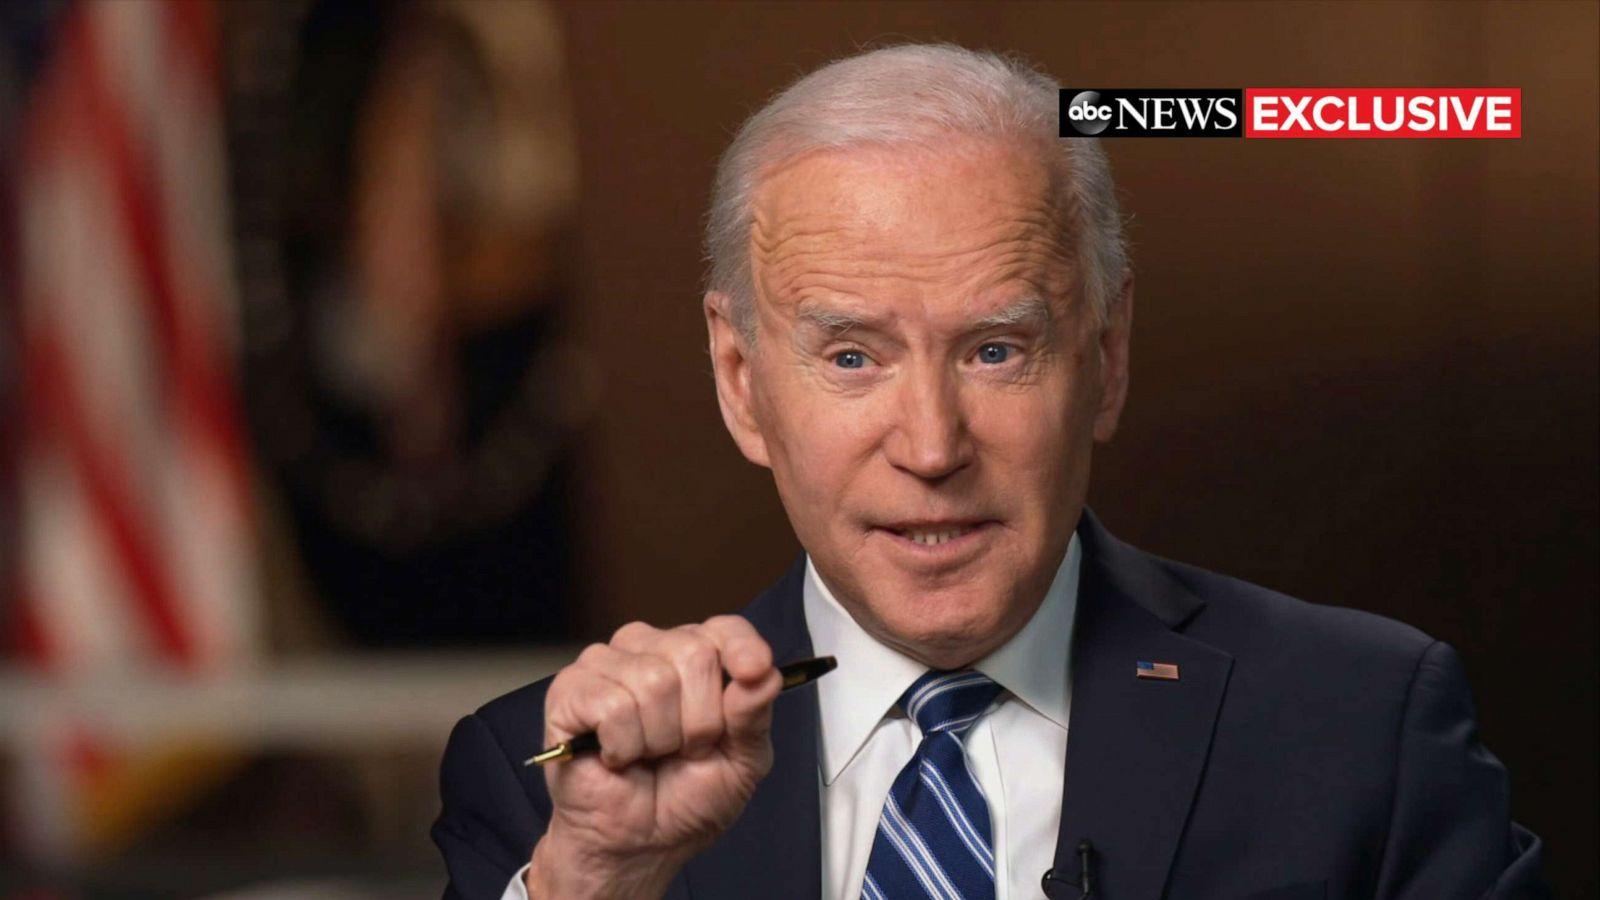 TRANSCRIPT: ABC News' George Stephanopoulos interviews President Joe Biden  - ABC News